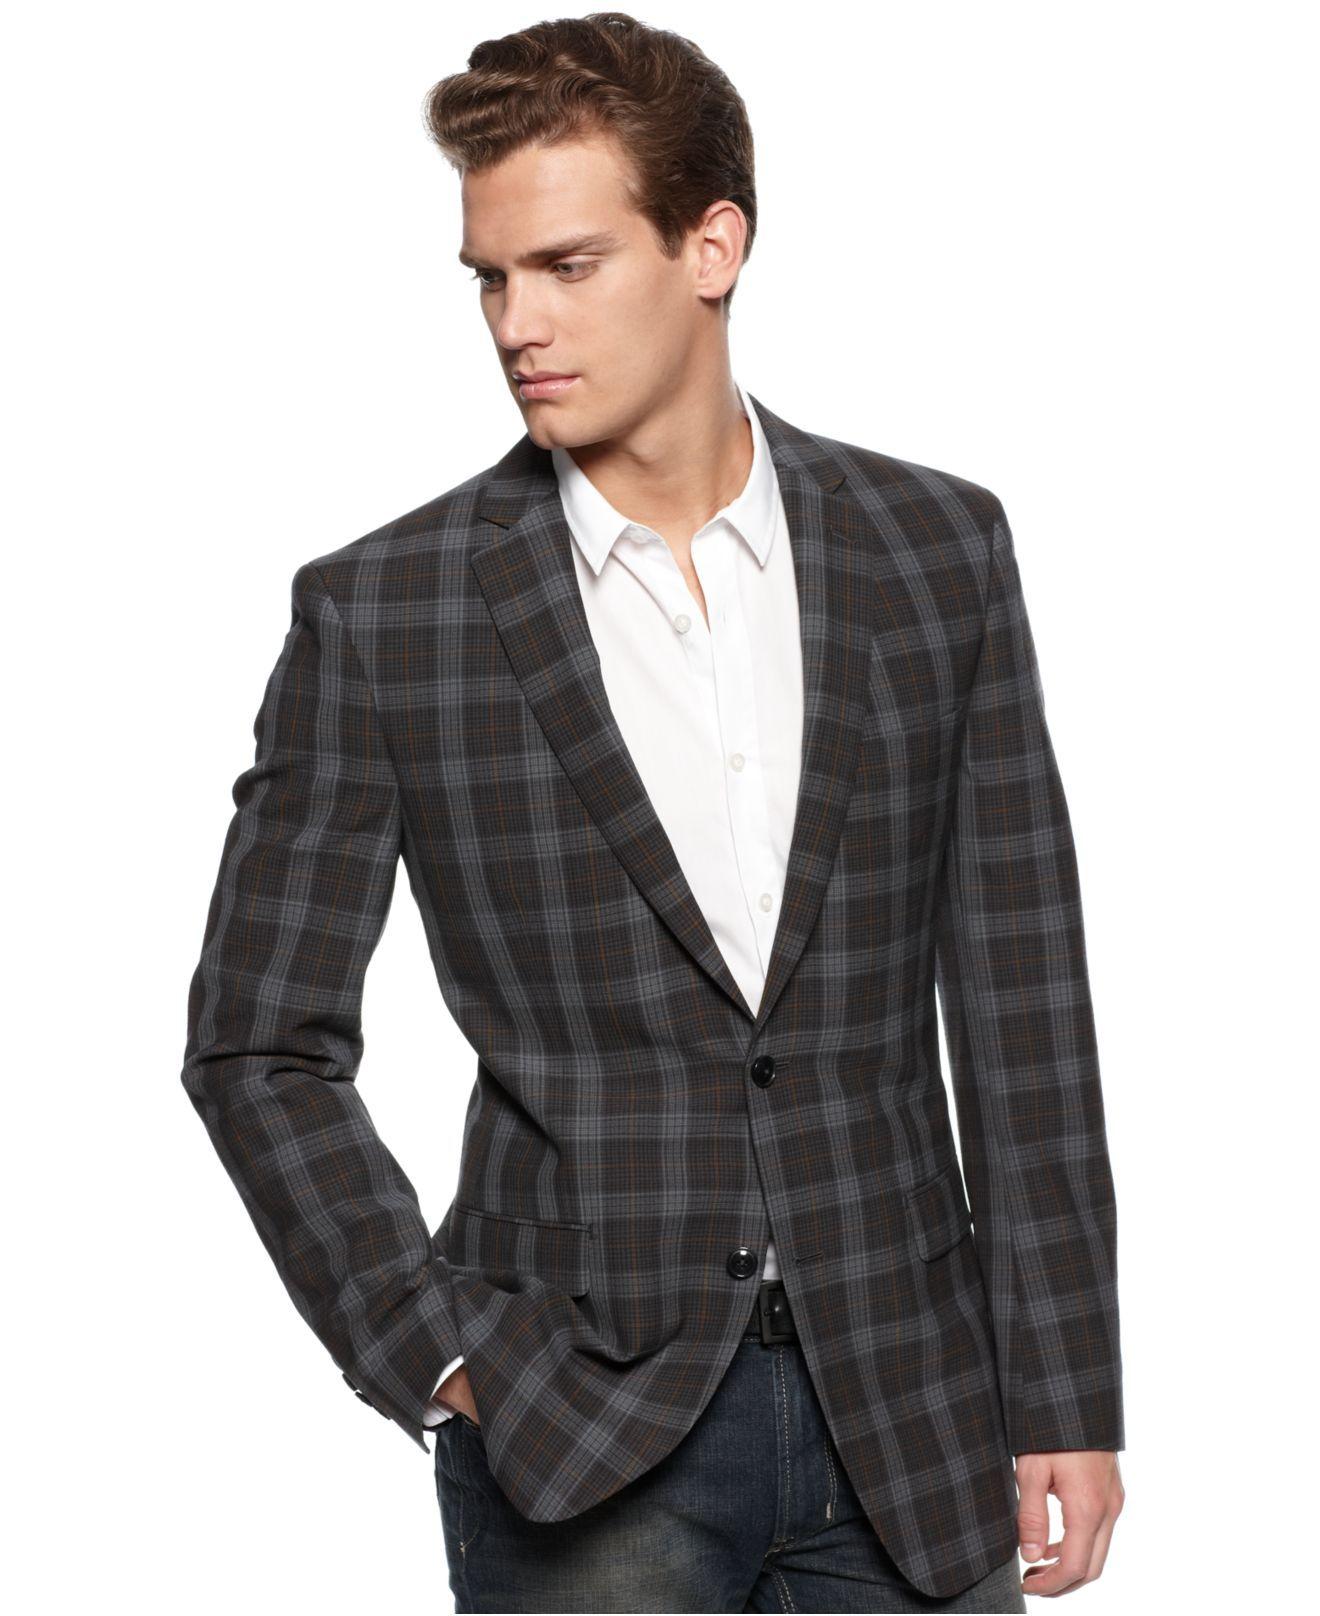 DKNY Jacket, Grey Plaid Seersucker Slim Fit Blazer Mens